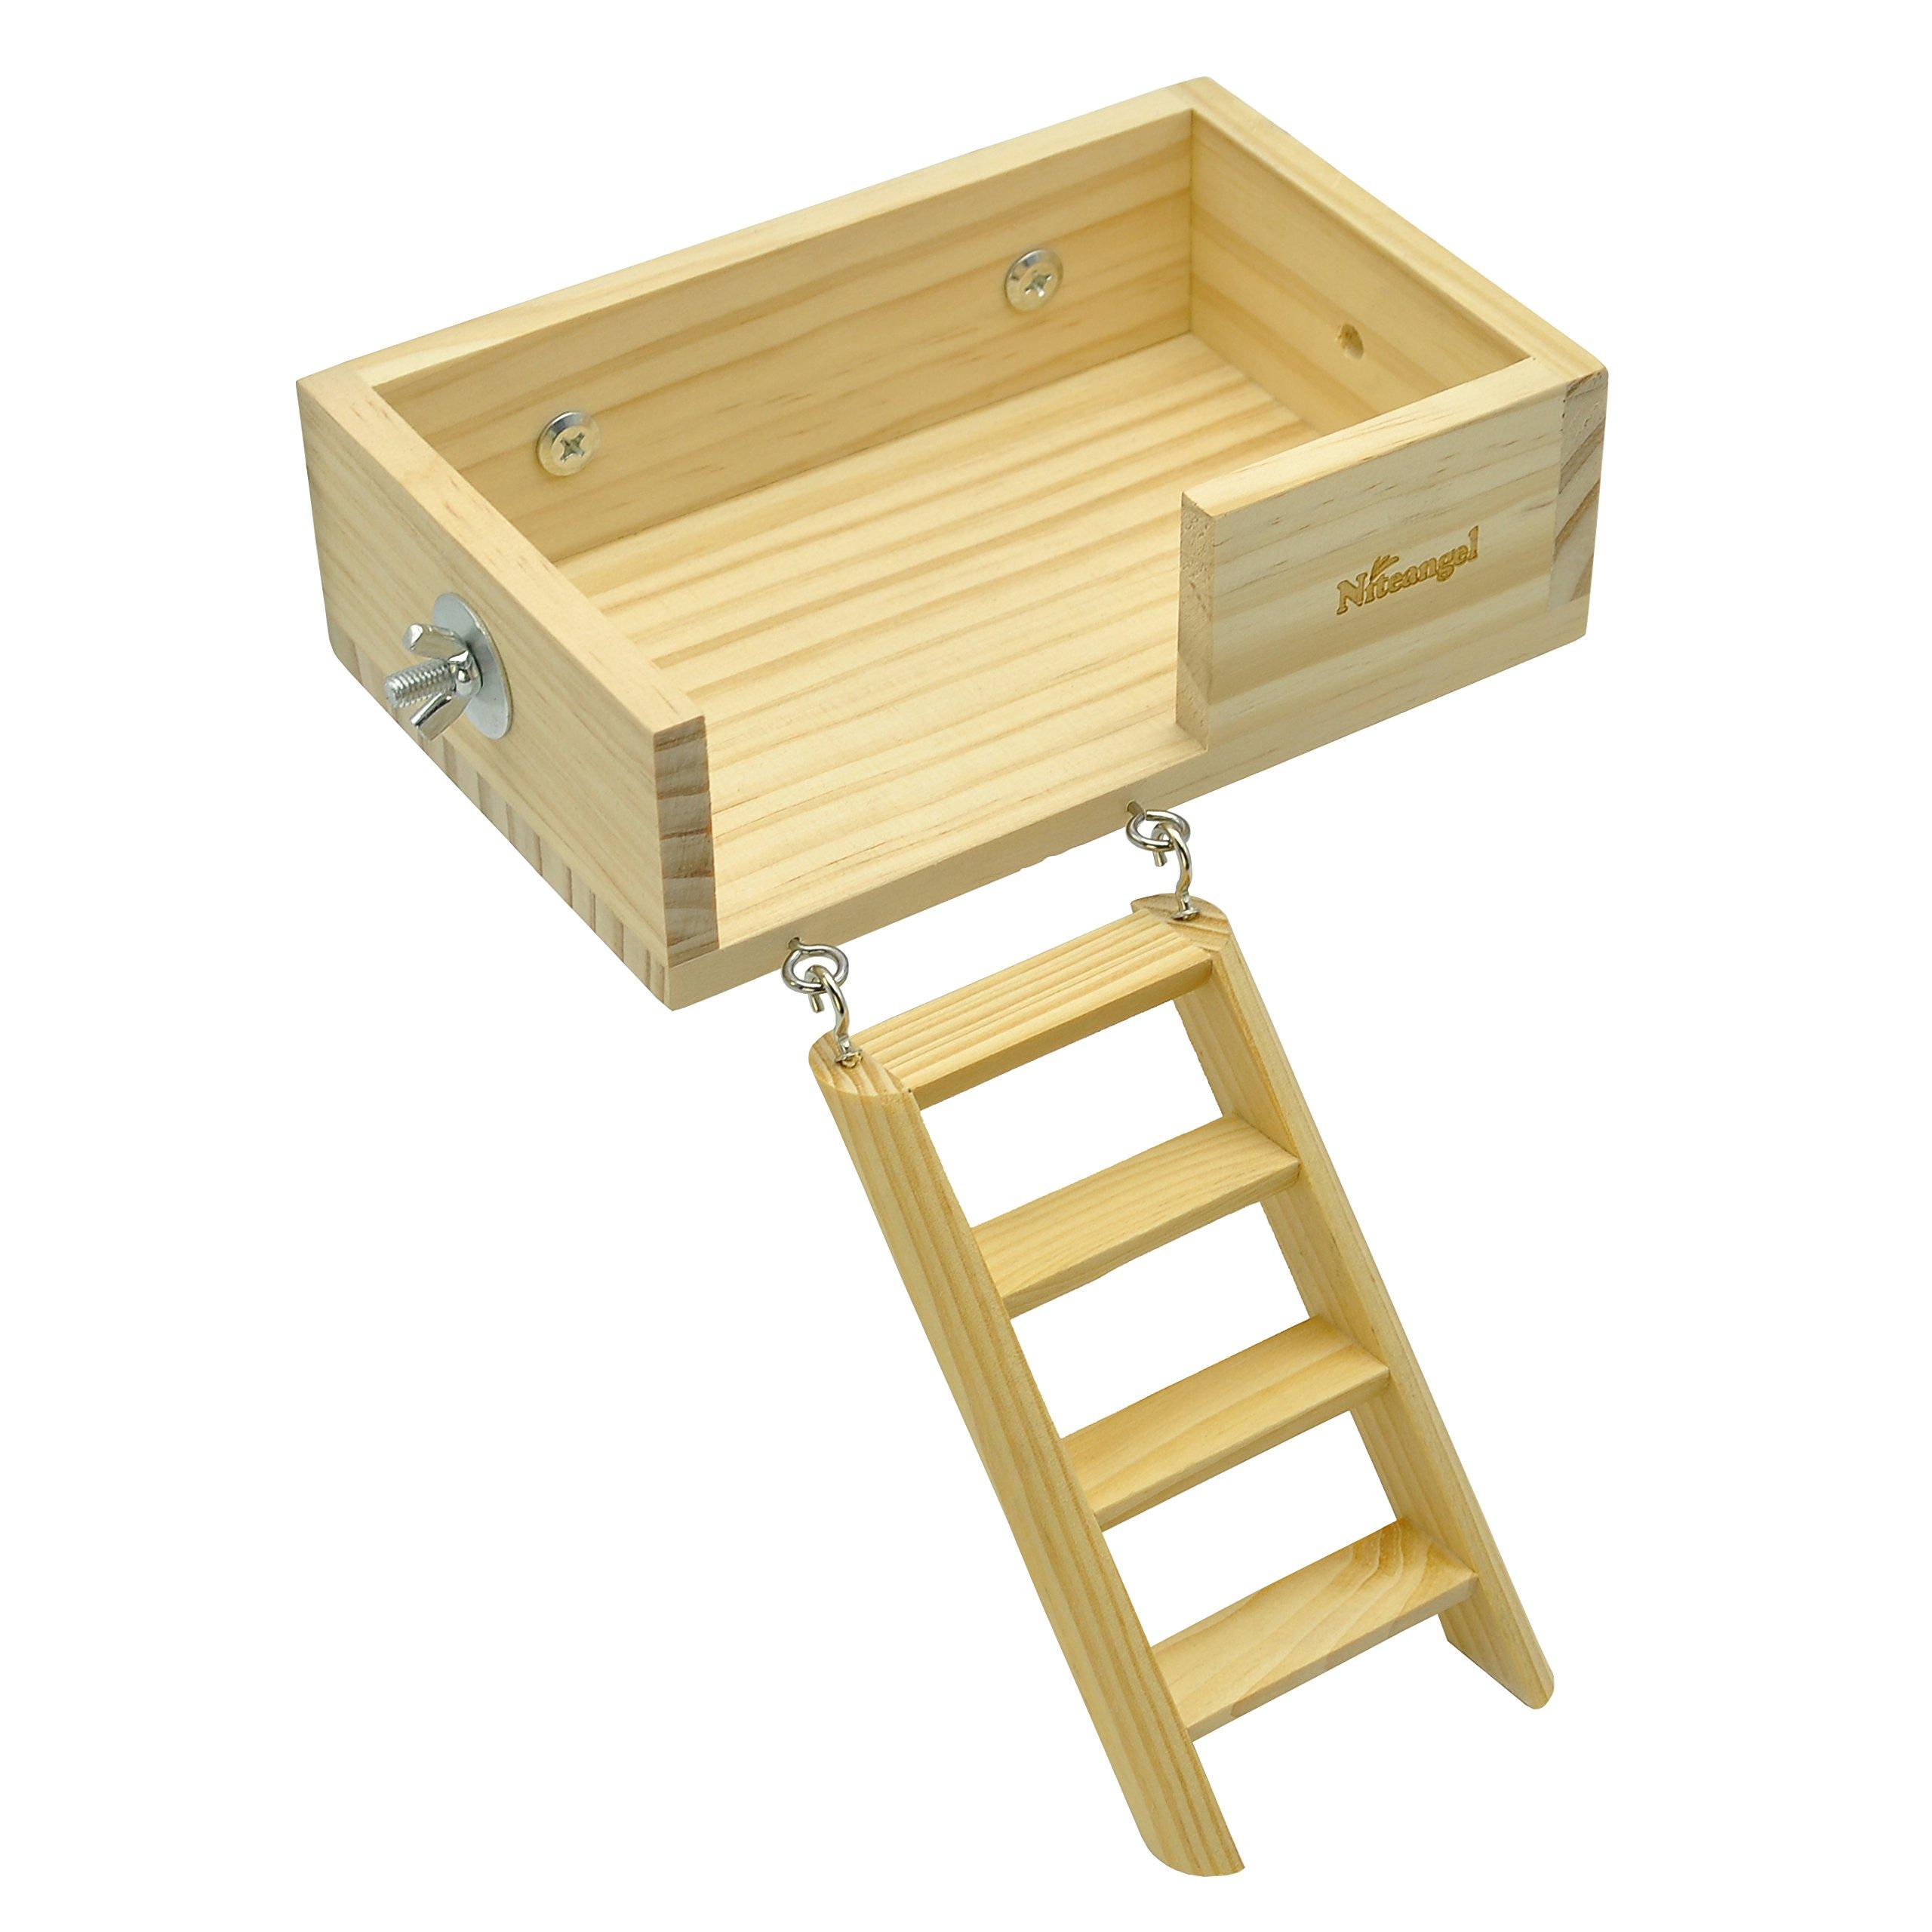 Niteangel Small Animal Wooden Platform, Climbing Kits by Niteangel